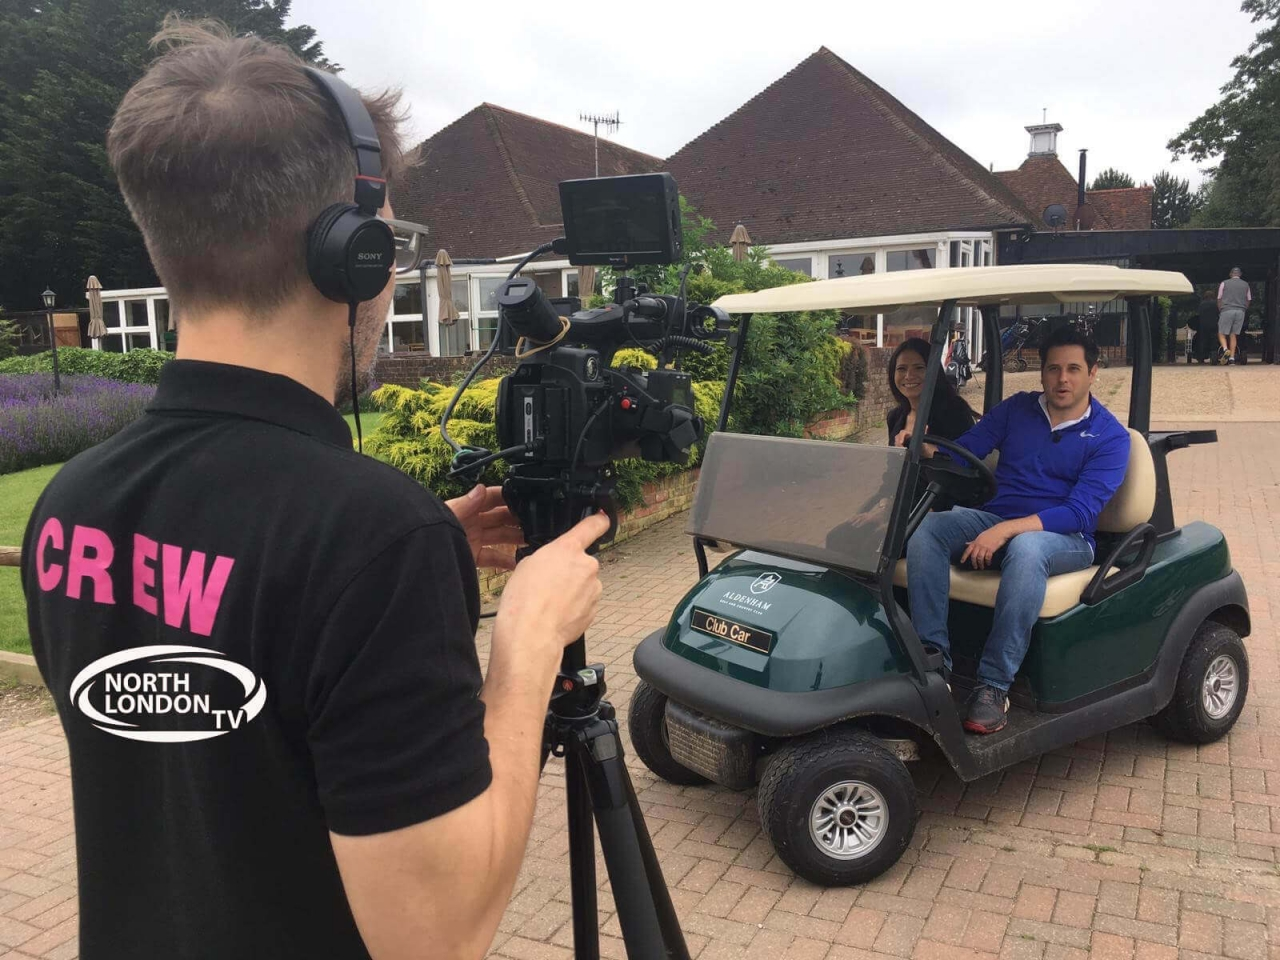 >North London TV: Series 2 Episode 3